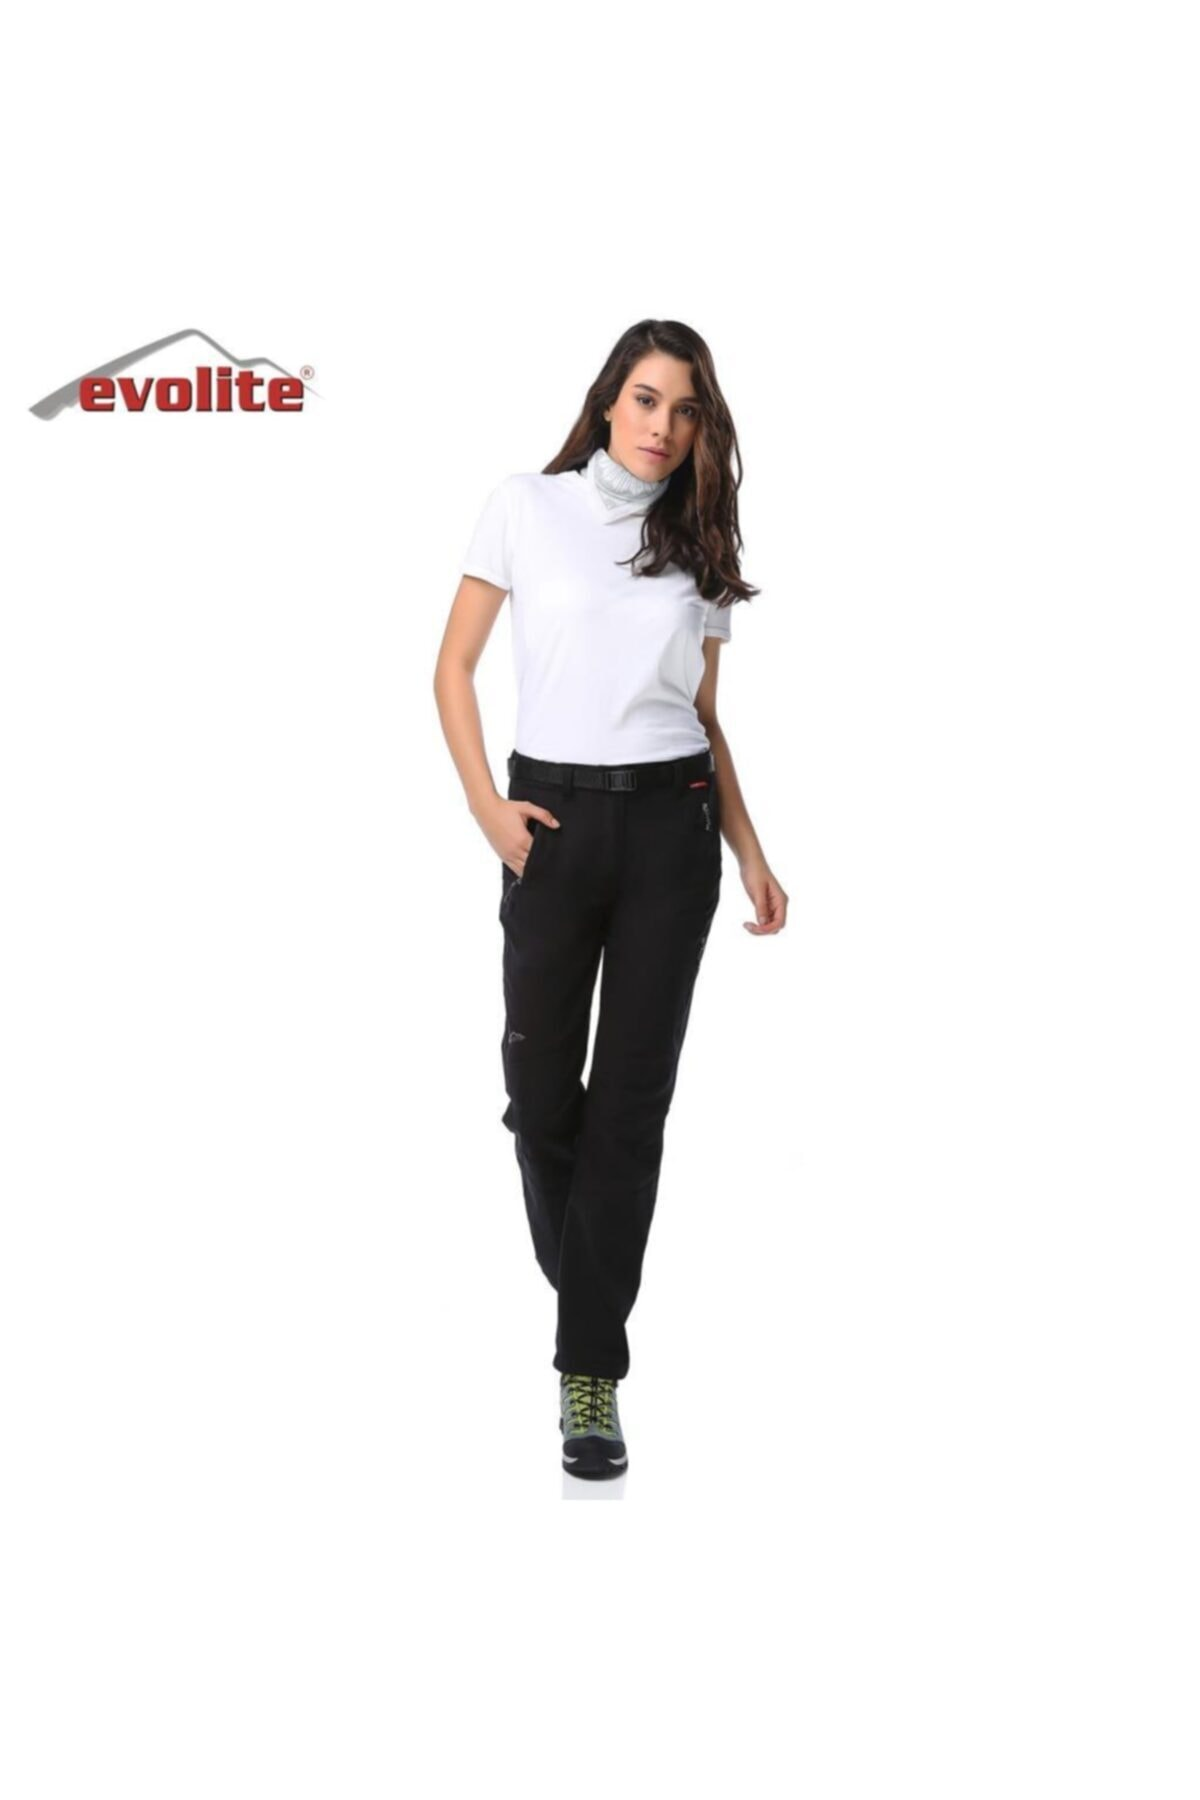 Evolite Point Softshell Bayan Pantolon 1